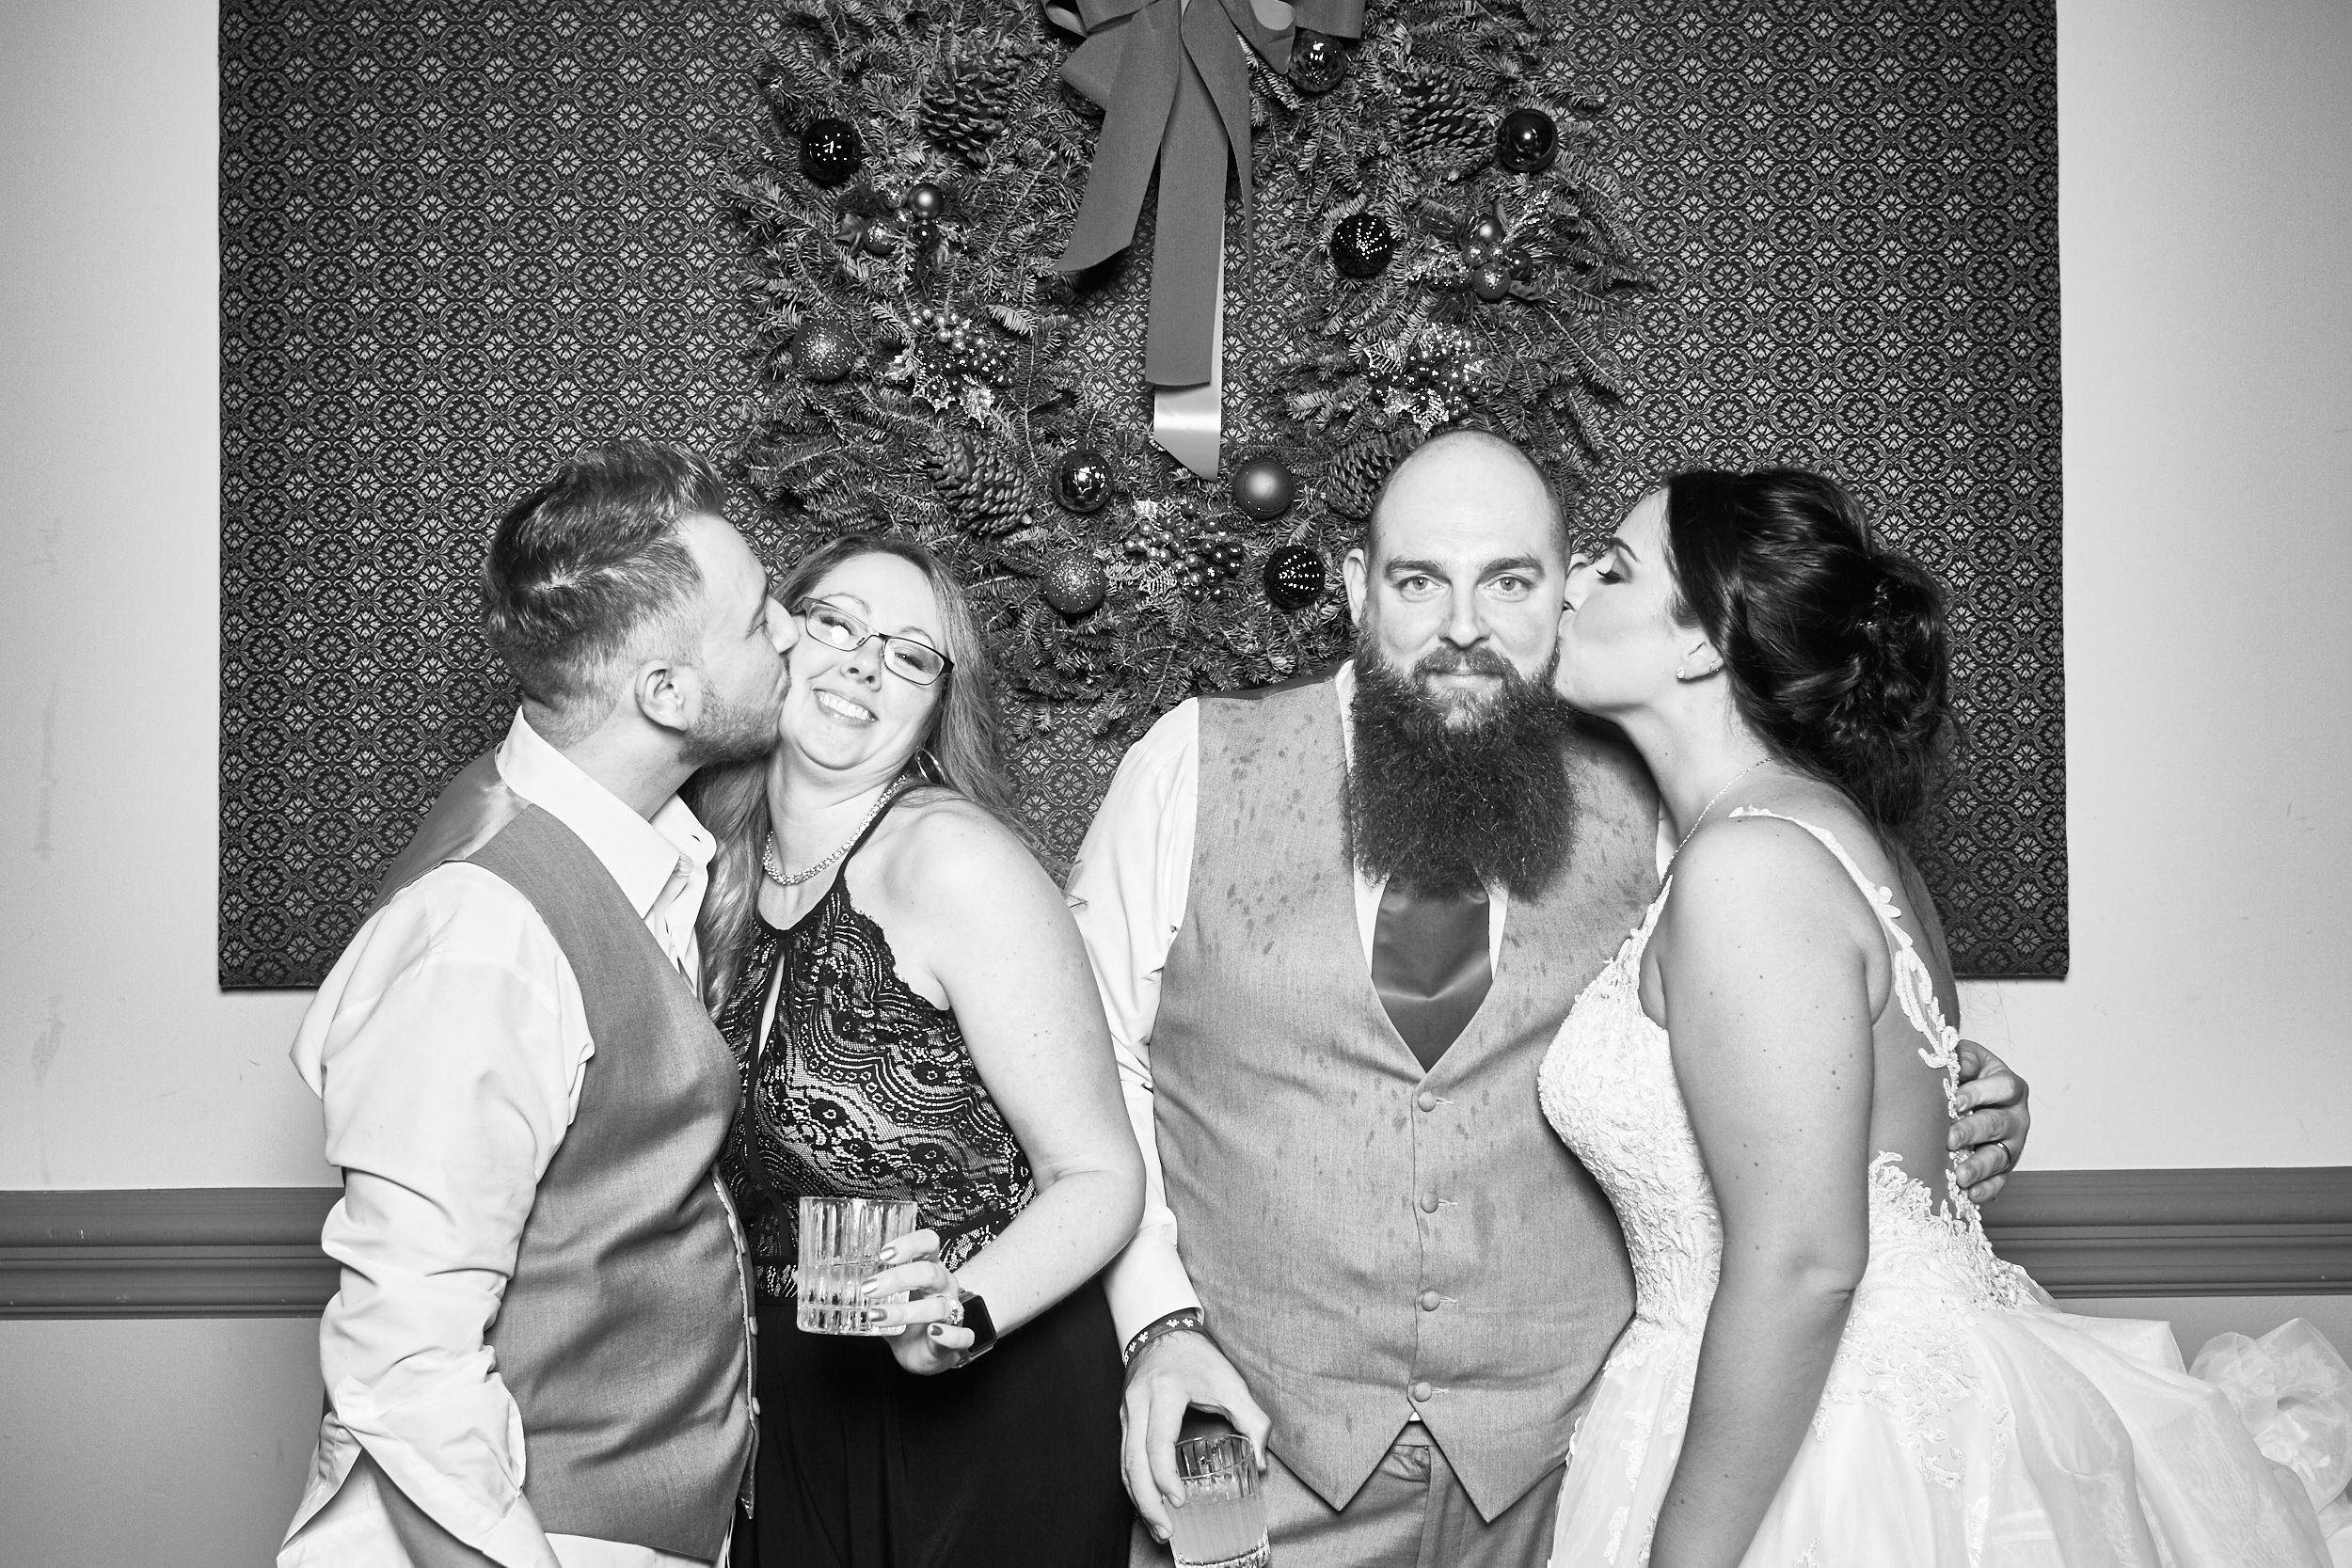 Alexa-James-Wedding-Photo-Booth985.jpg